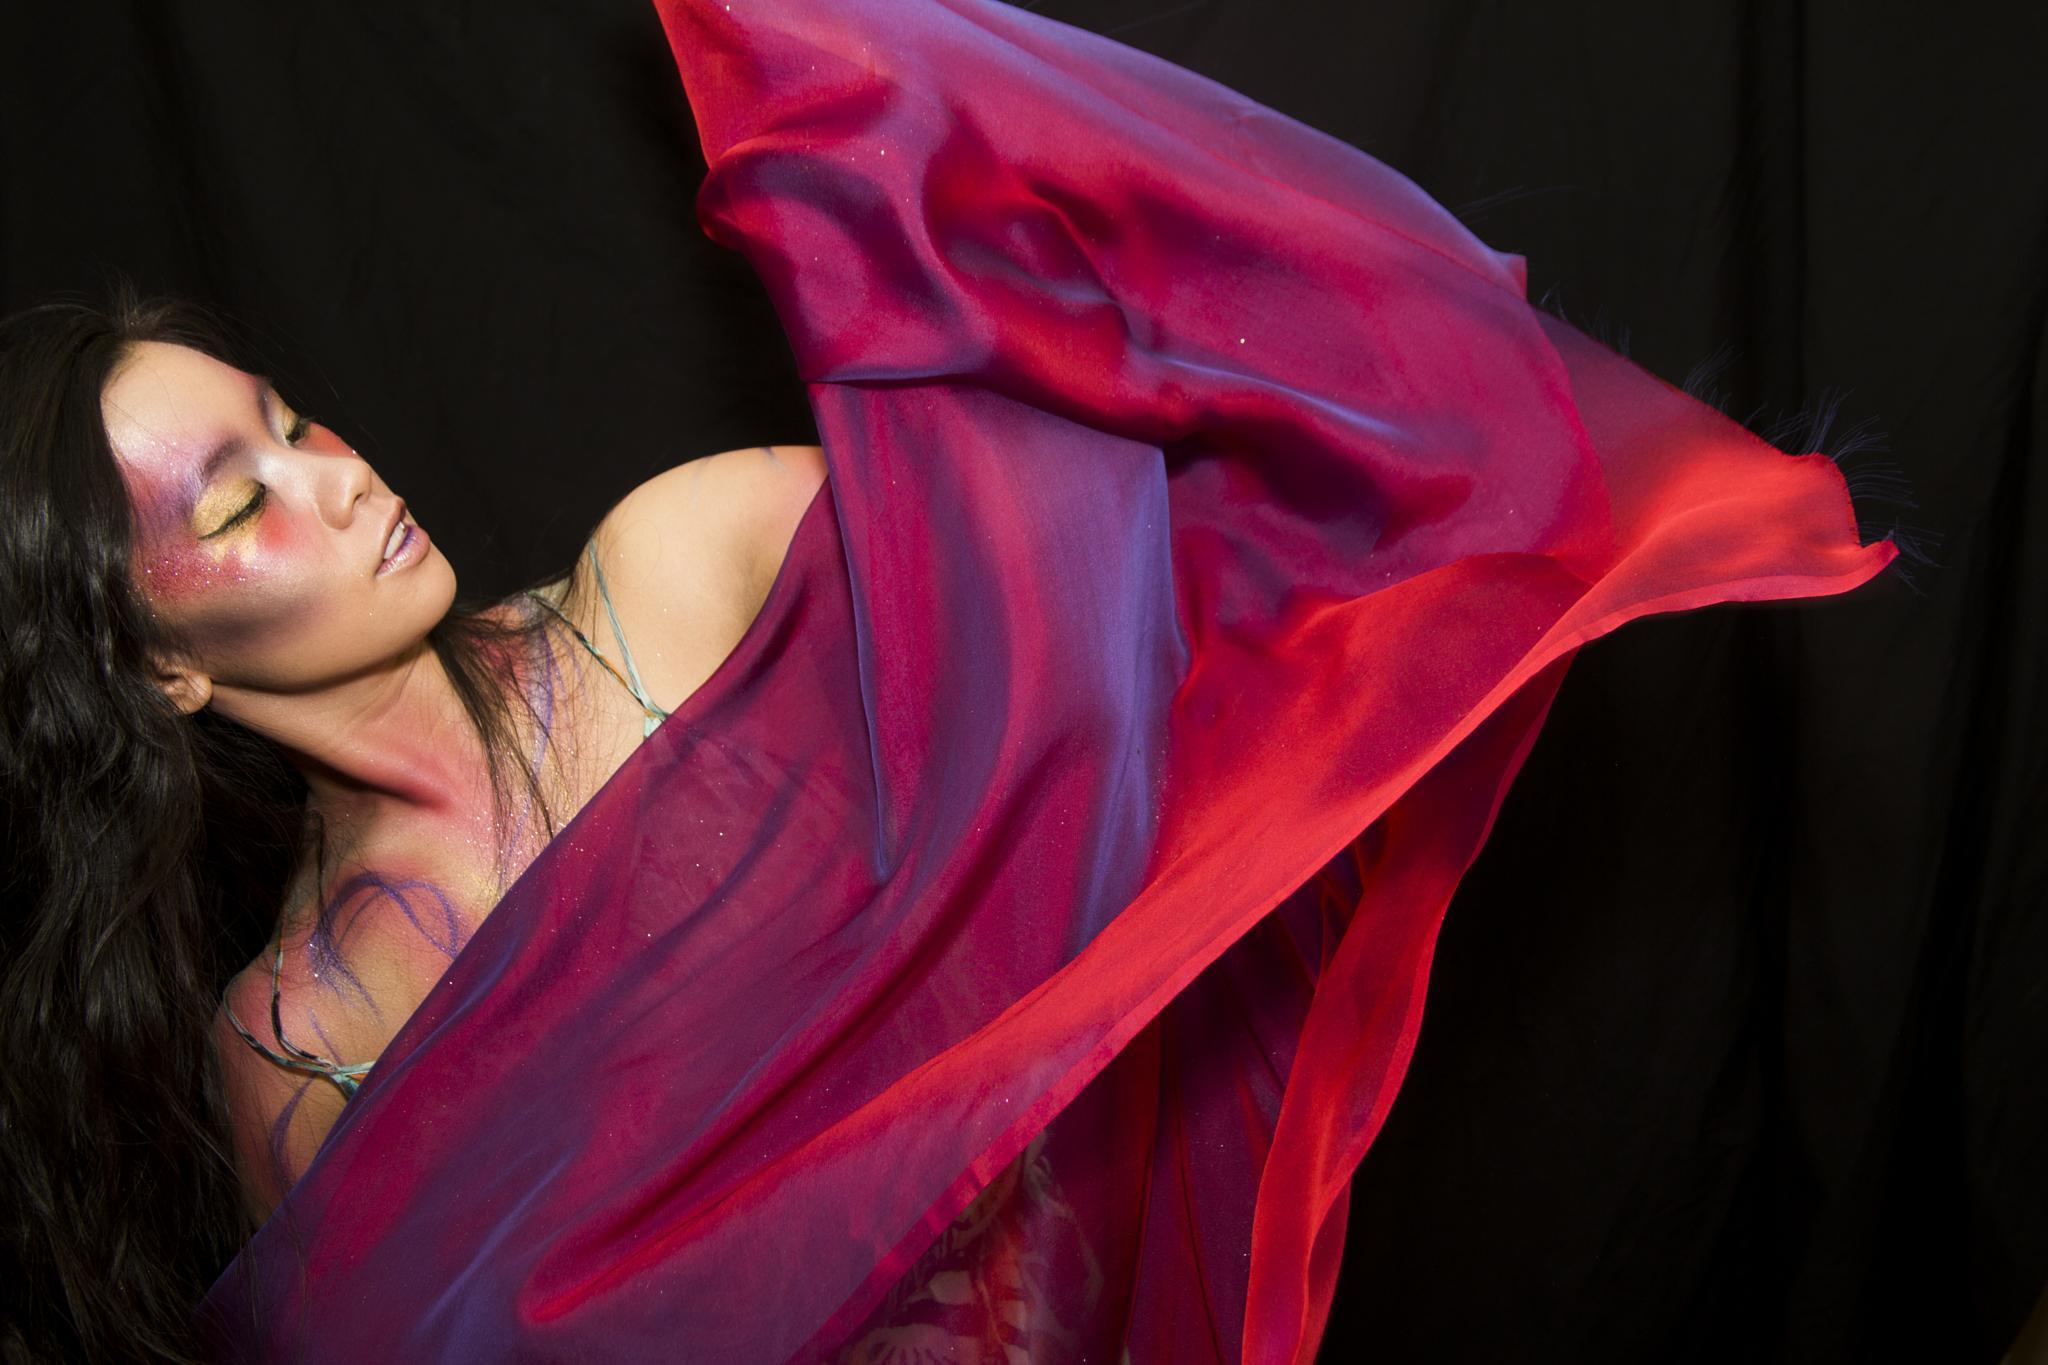 Makeup & Materiality: Maria by Jennifer Vatza